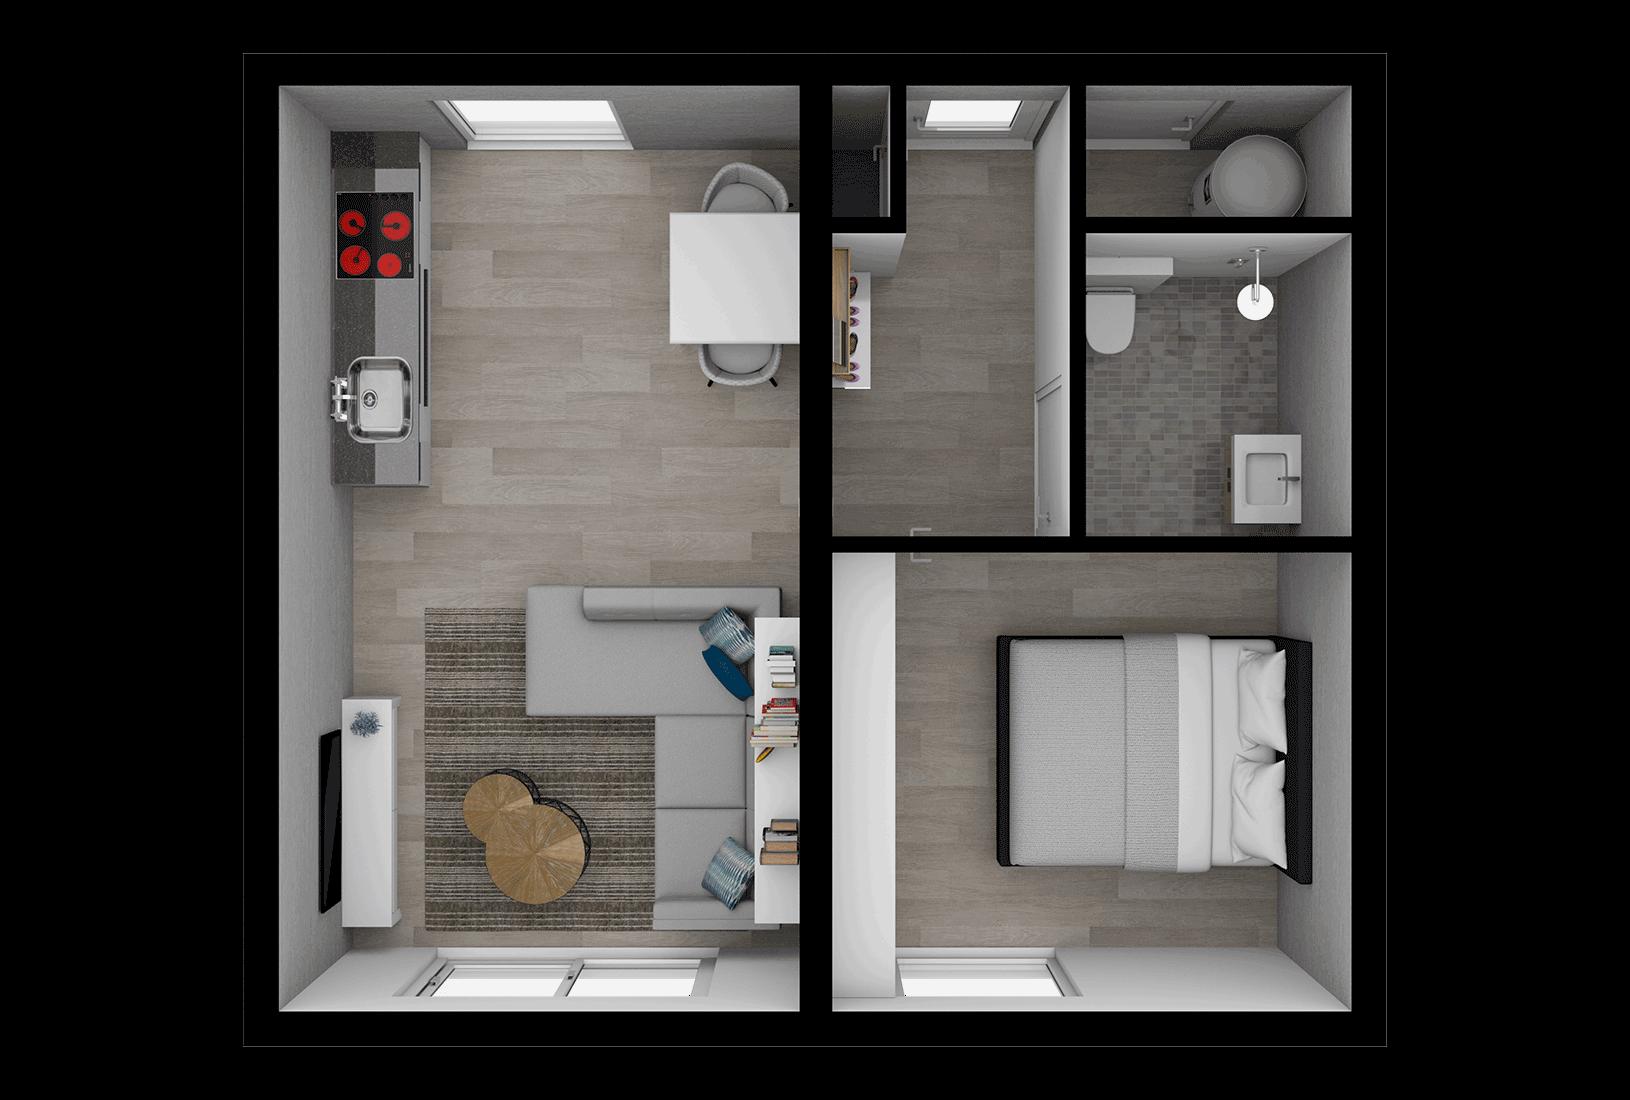 Tiny House_Type Alaska_Interieur plattegrond_Innoblox